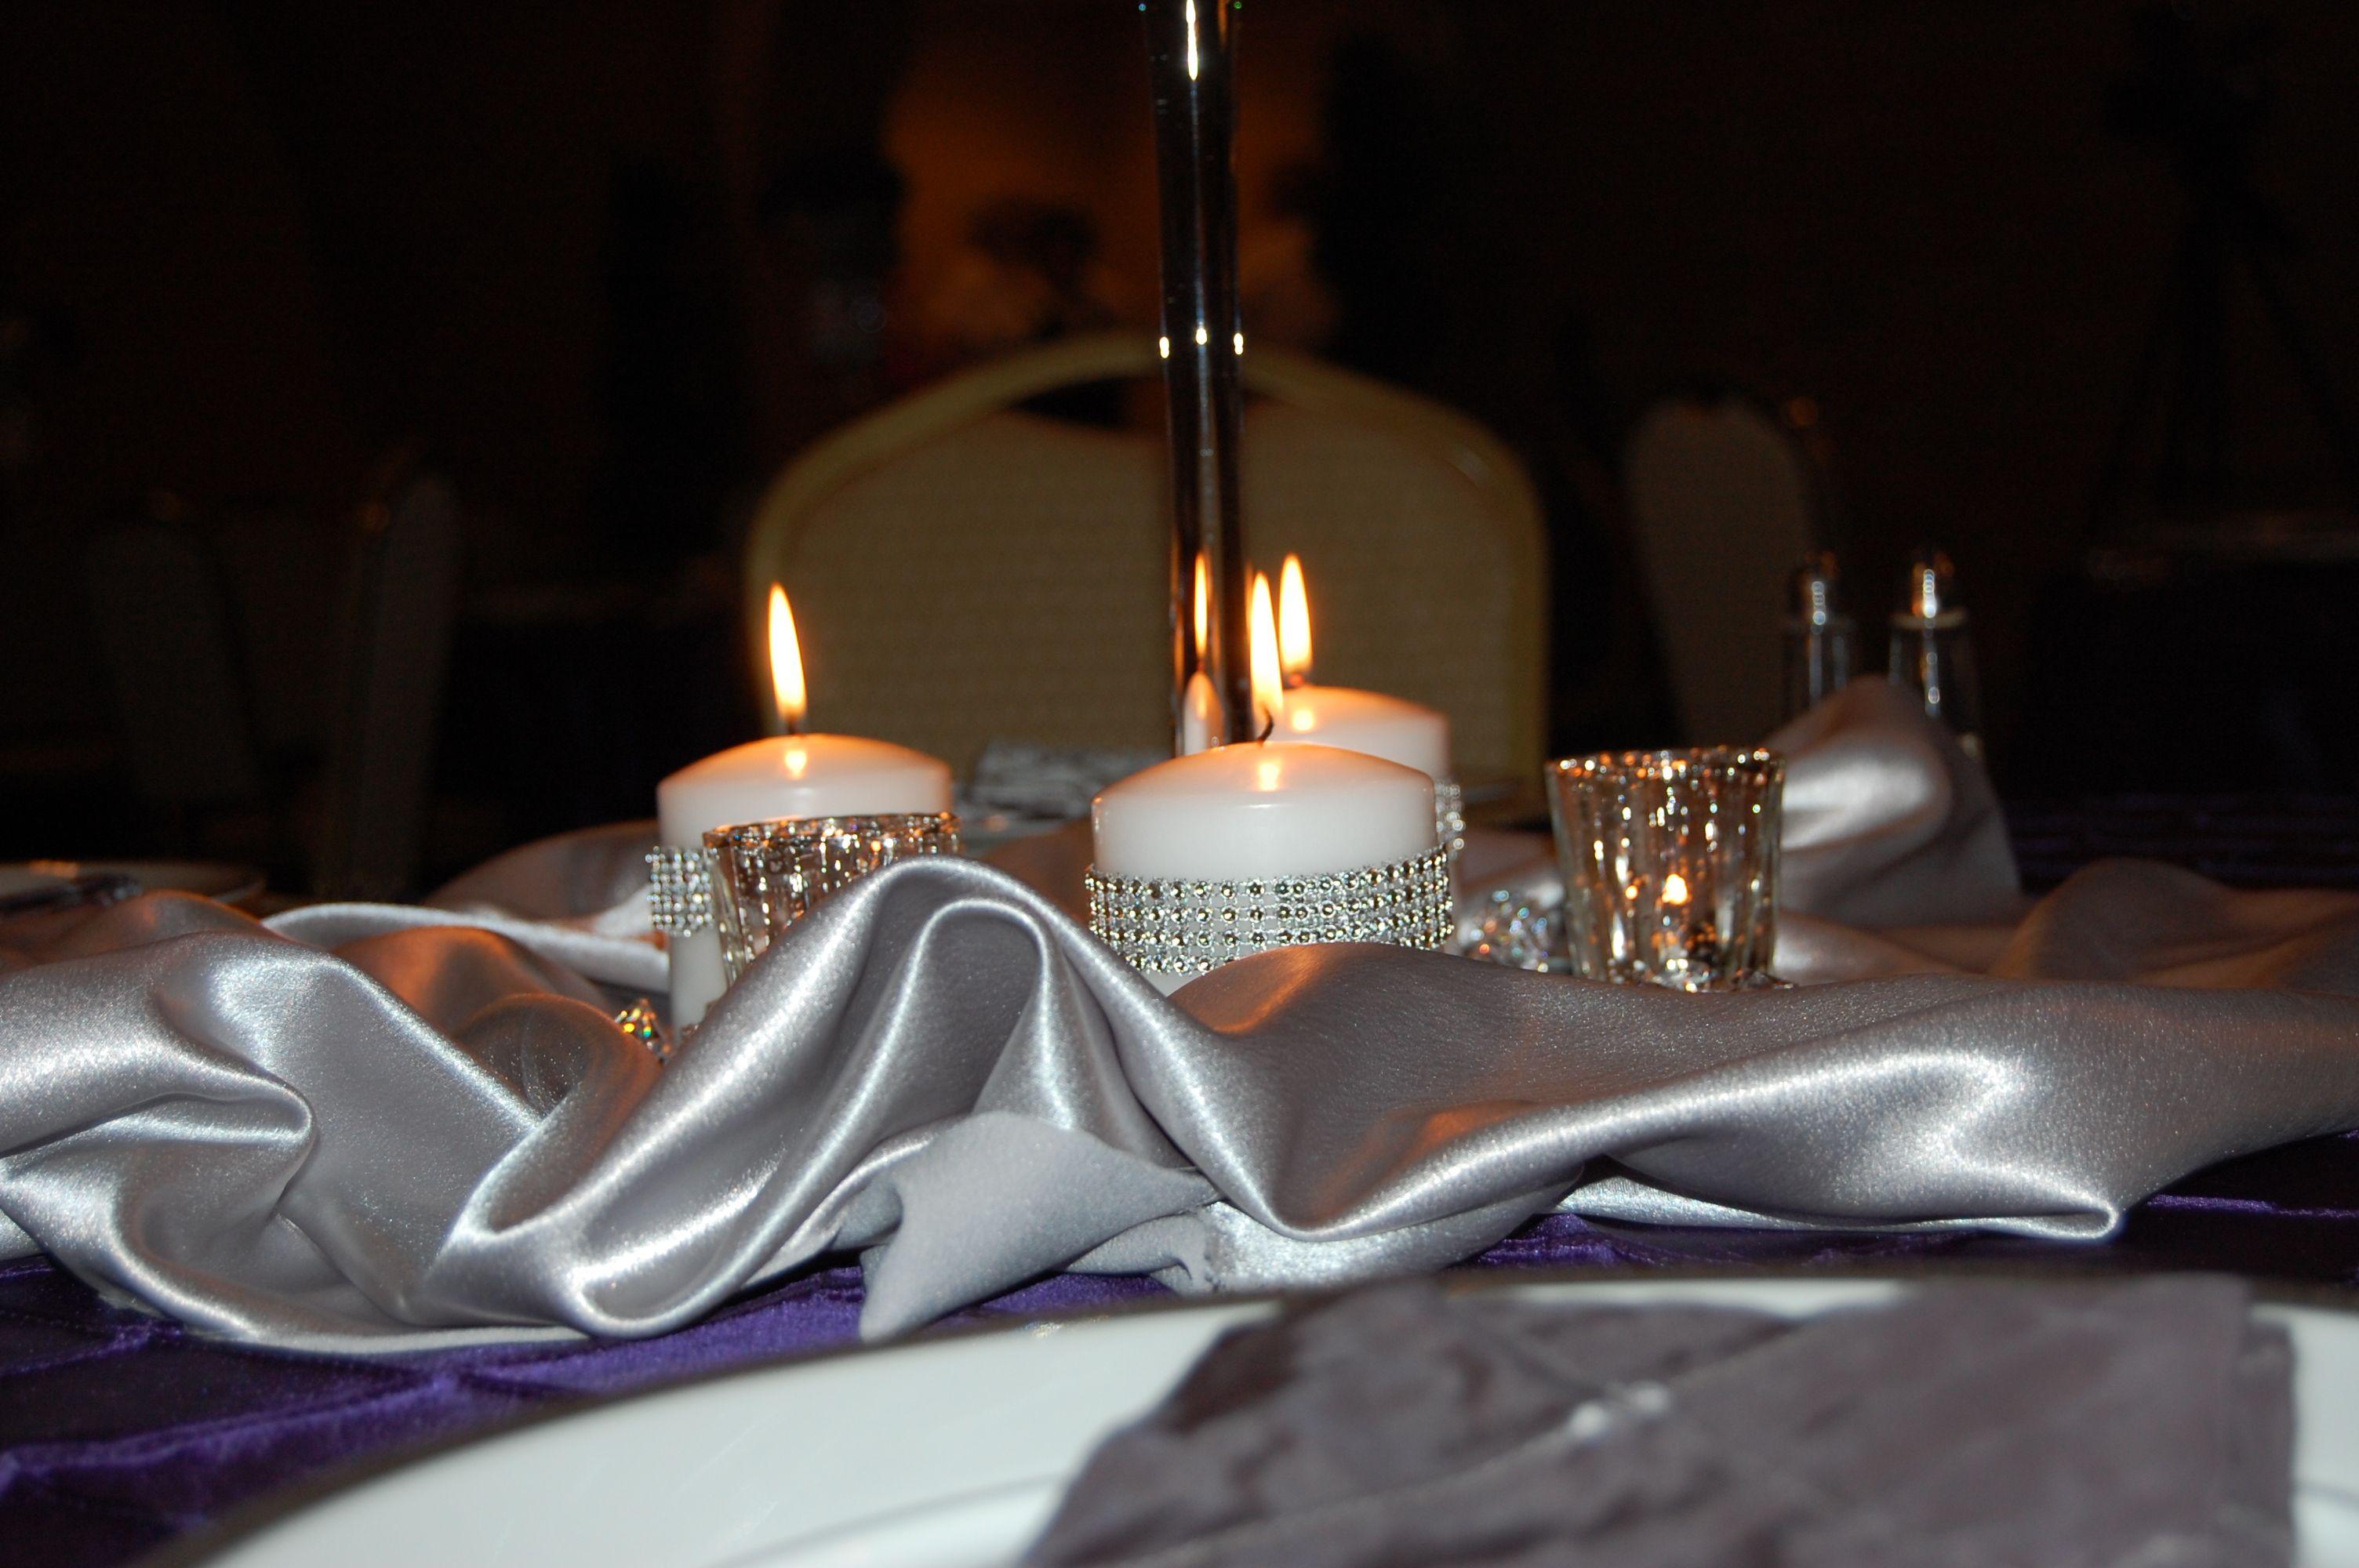 Rehearsal dinner table decorations wedding pinterest for Wedding dinner table decoration ideas